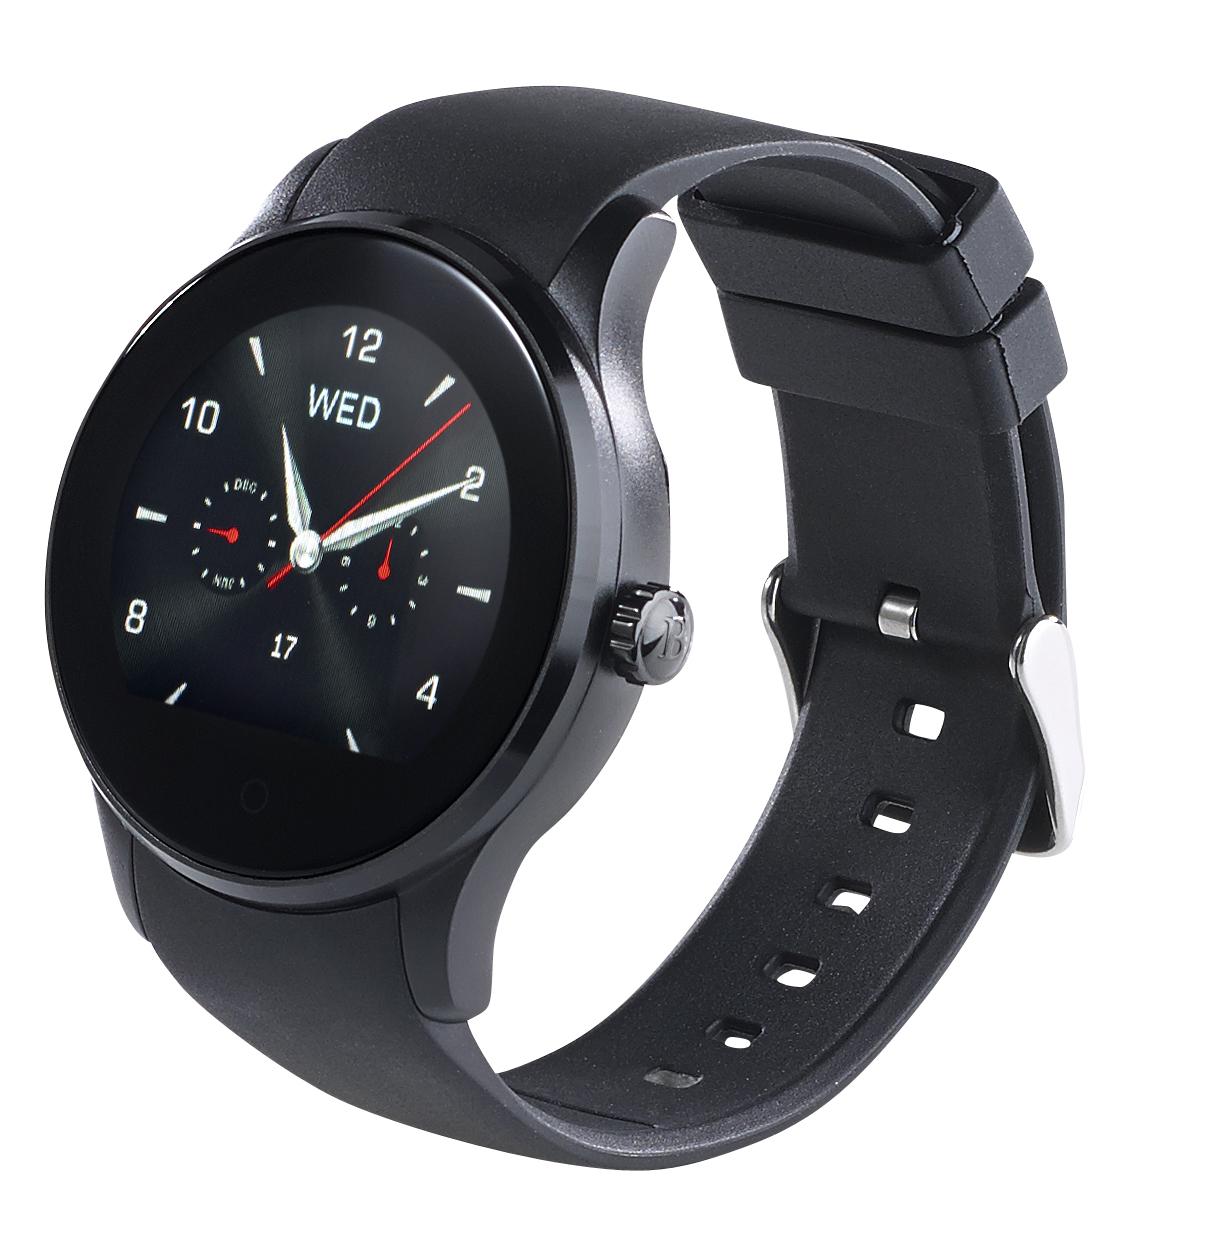 simvalley mobile handy uhr bluetooth smartwatch f r ios. Black Bedroom Furniture Sets. Home Design Ideas